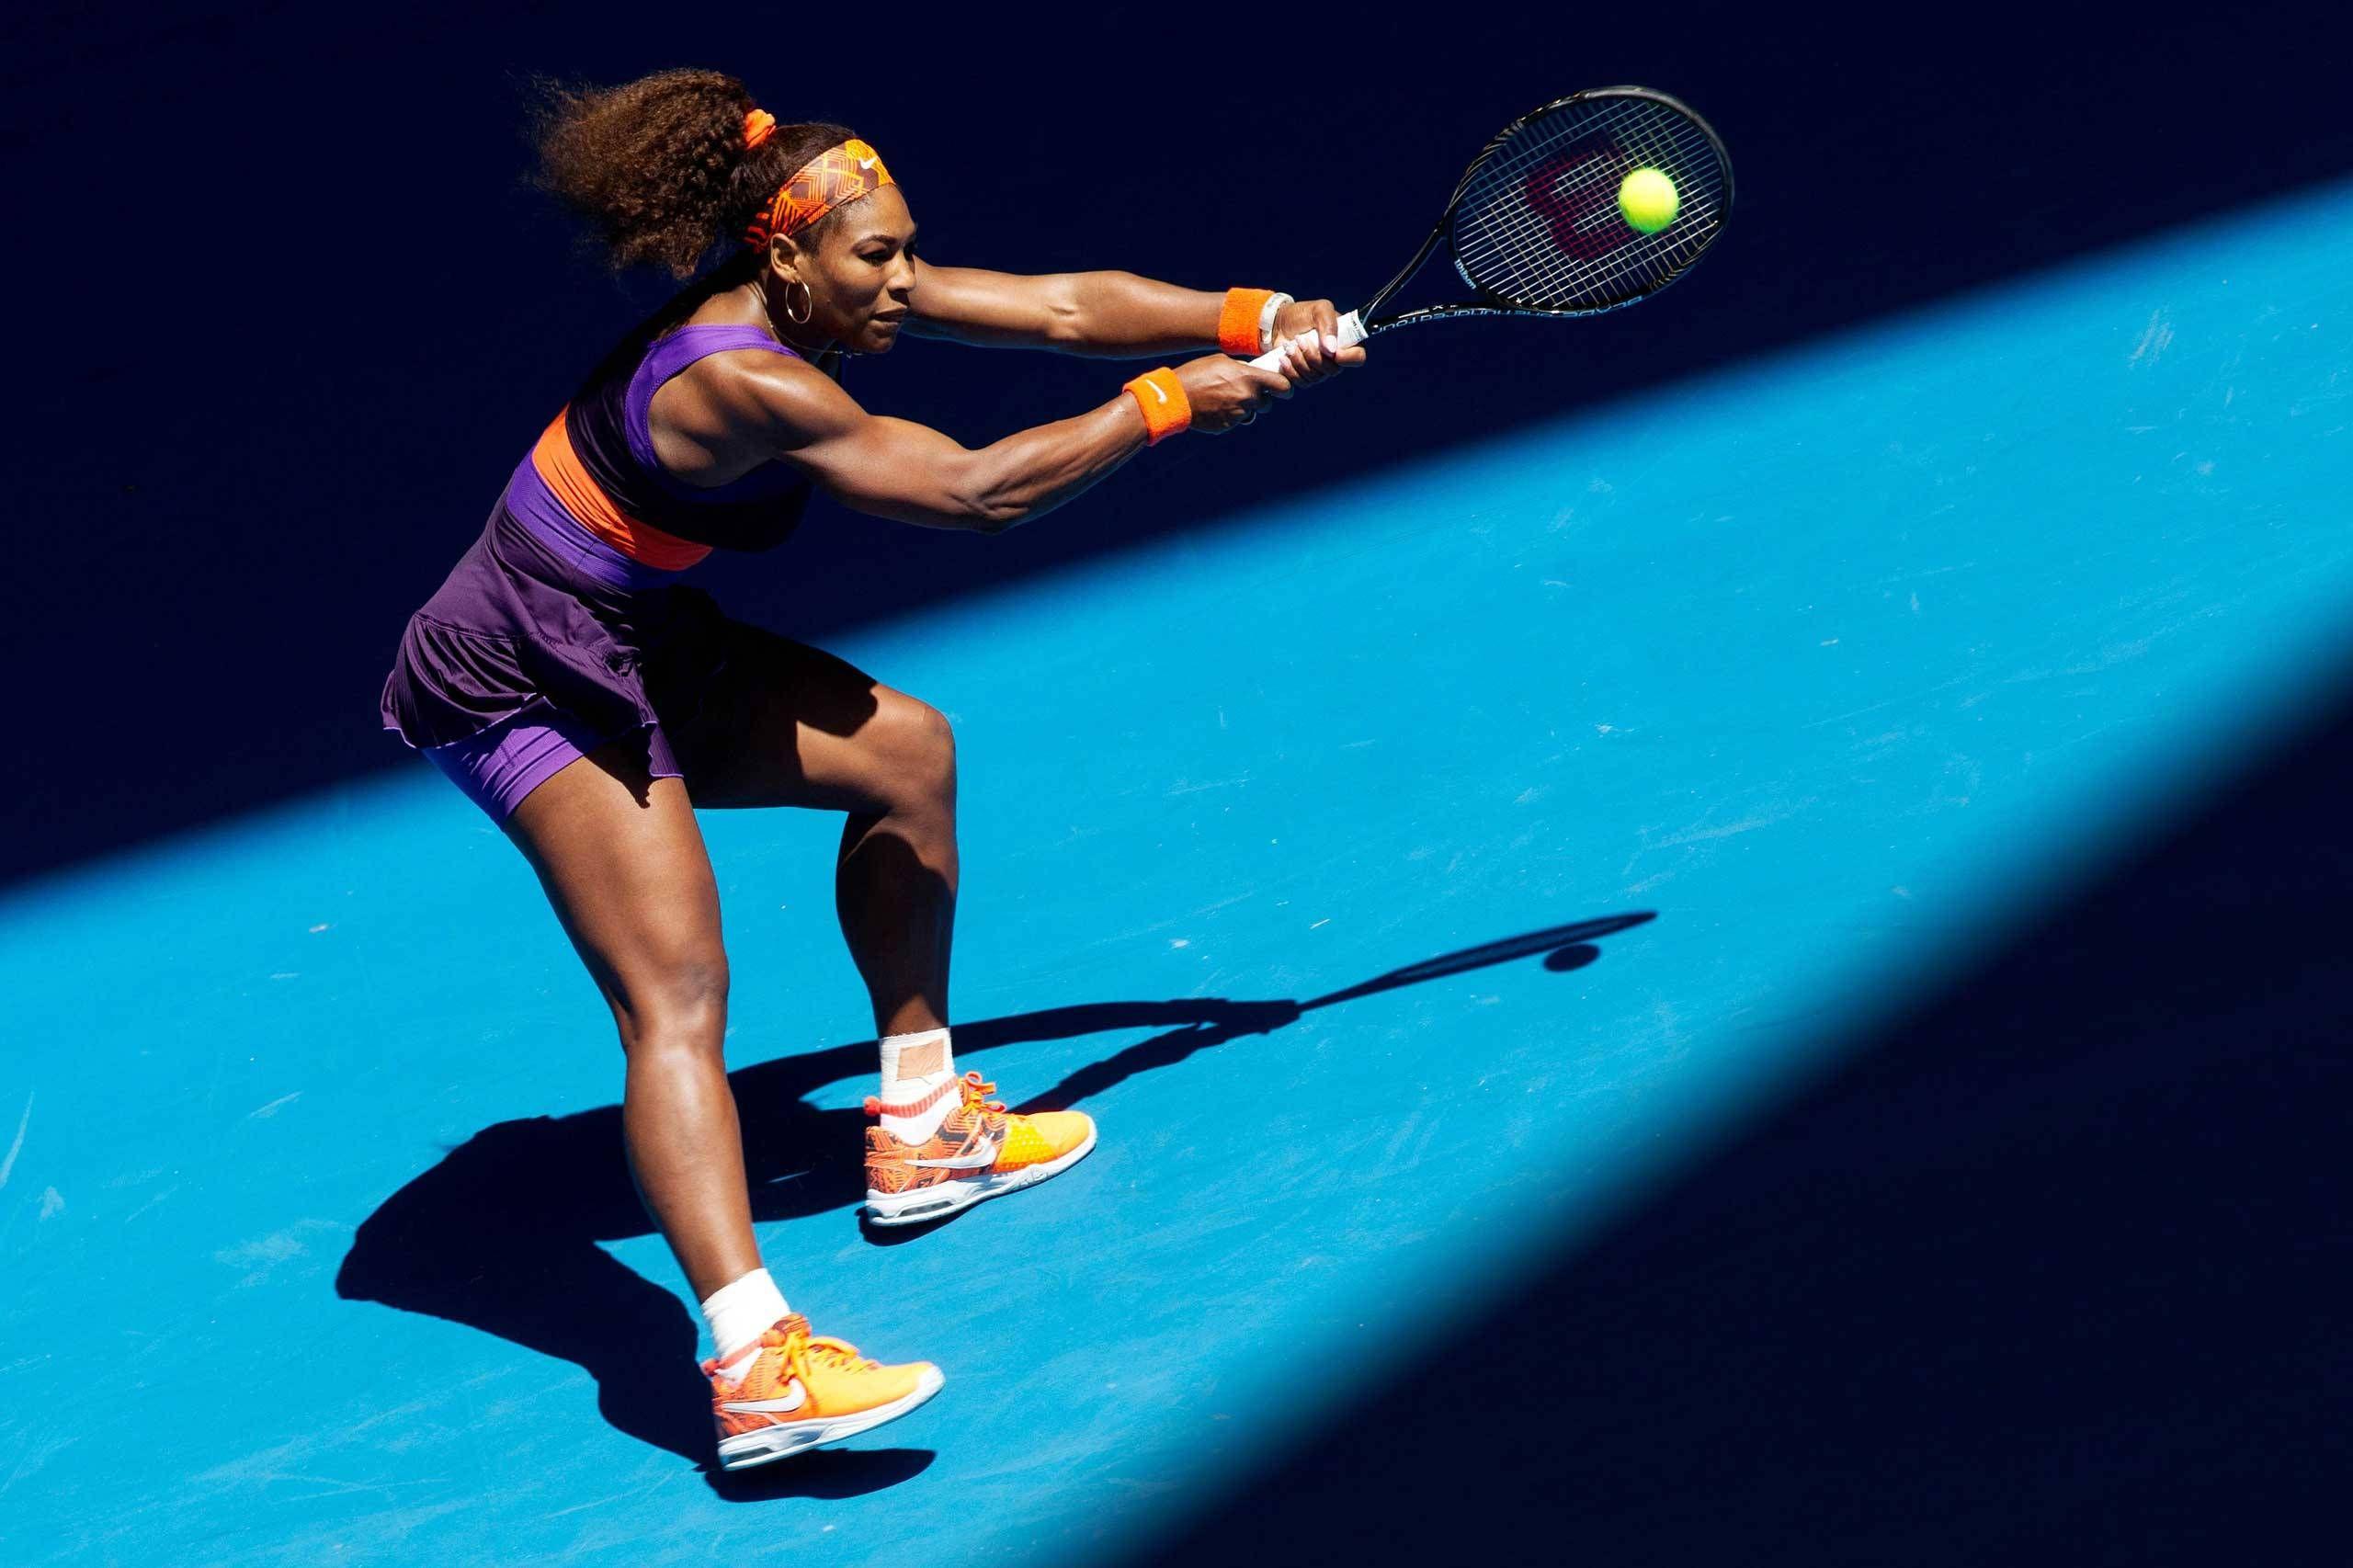 Serena Williams returns a shot against Ayumi Morita in the